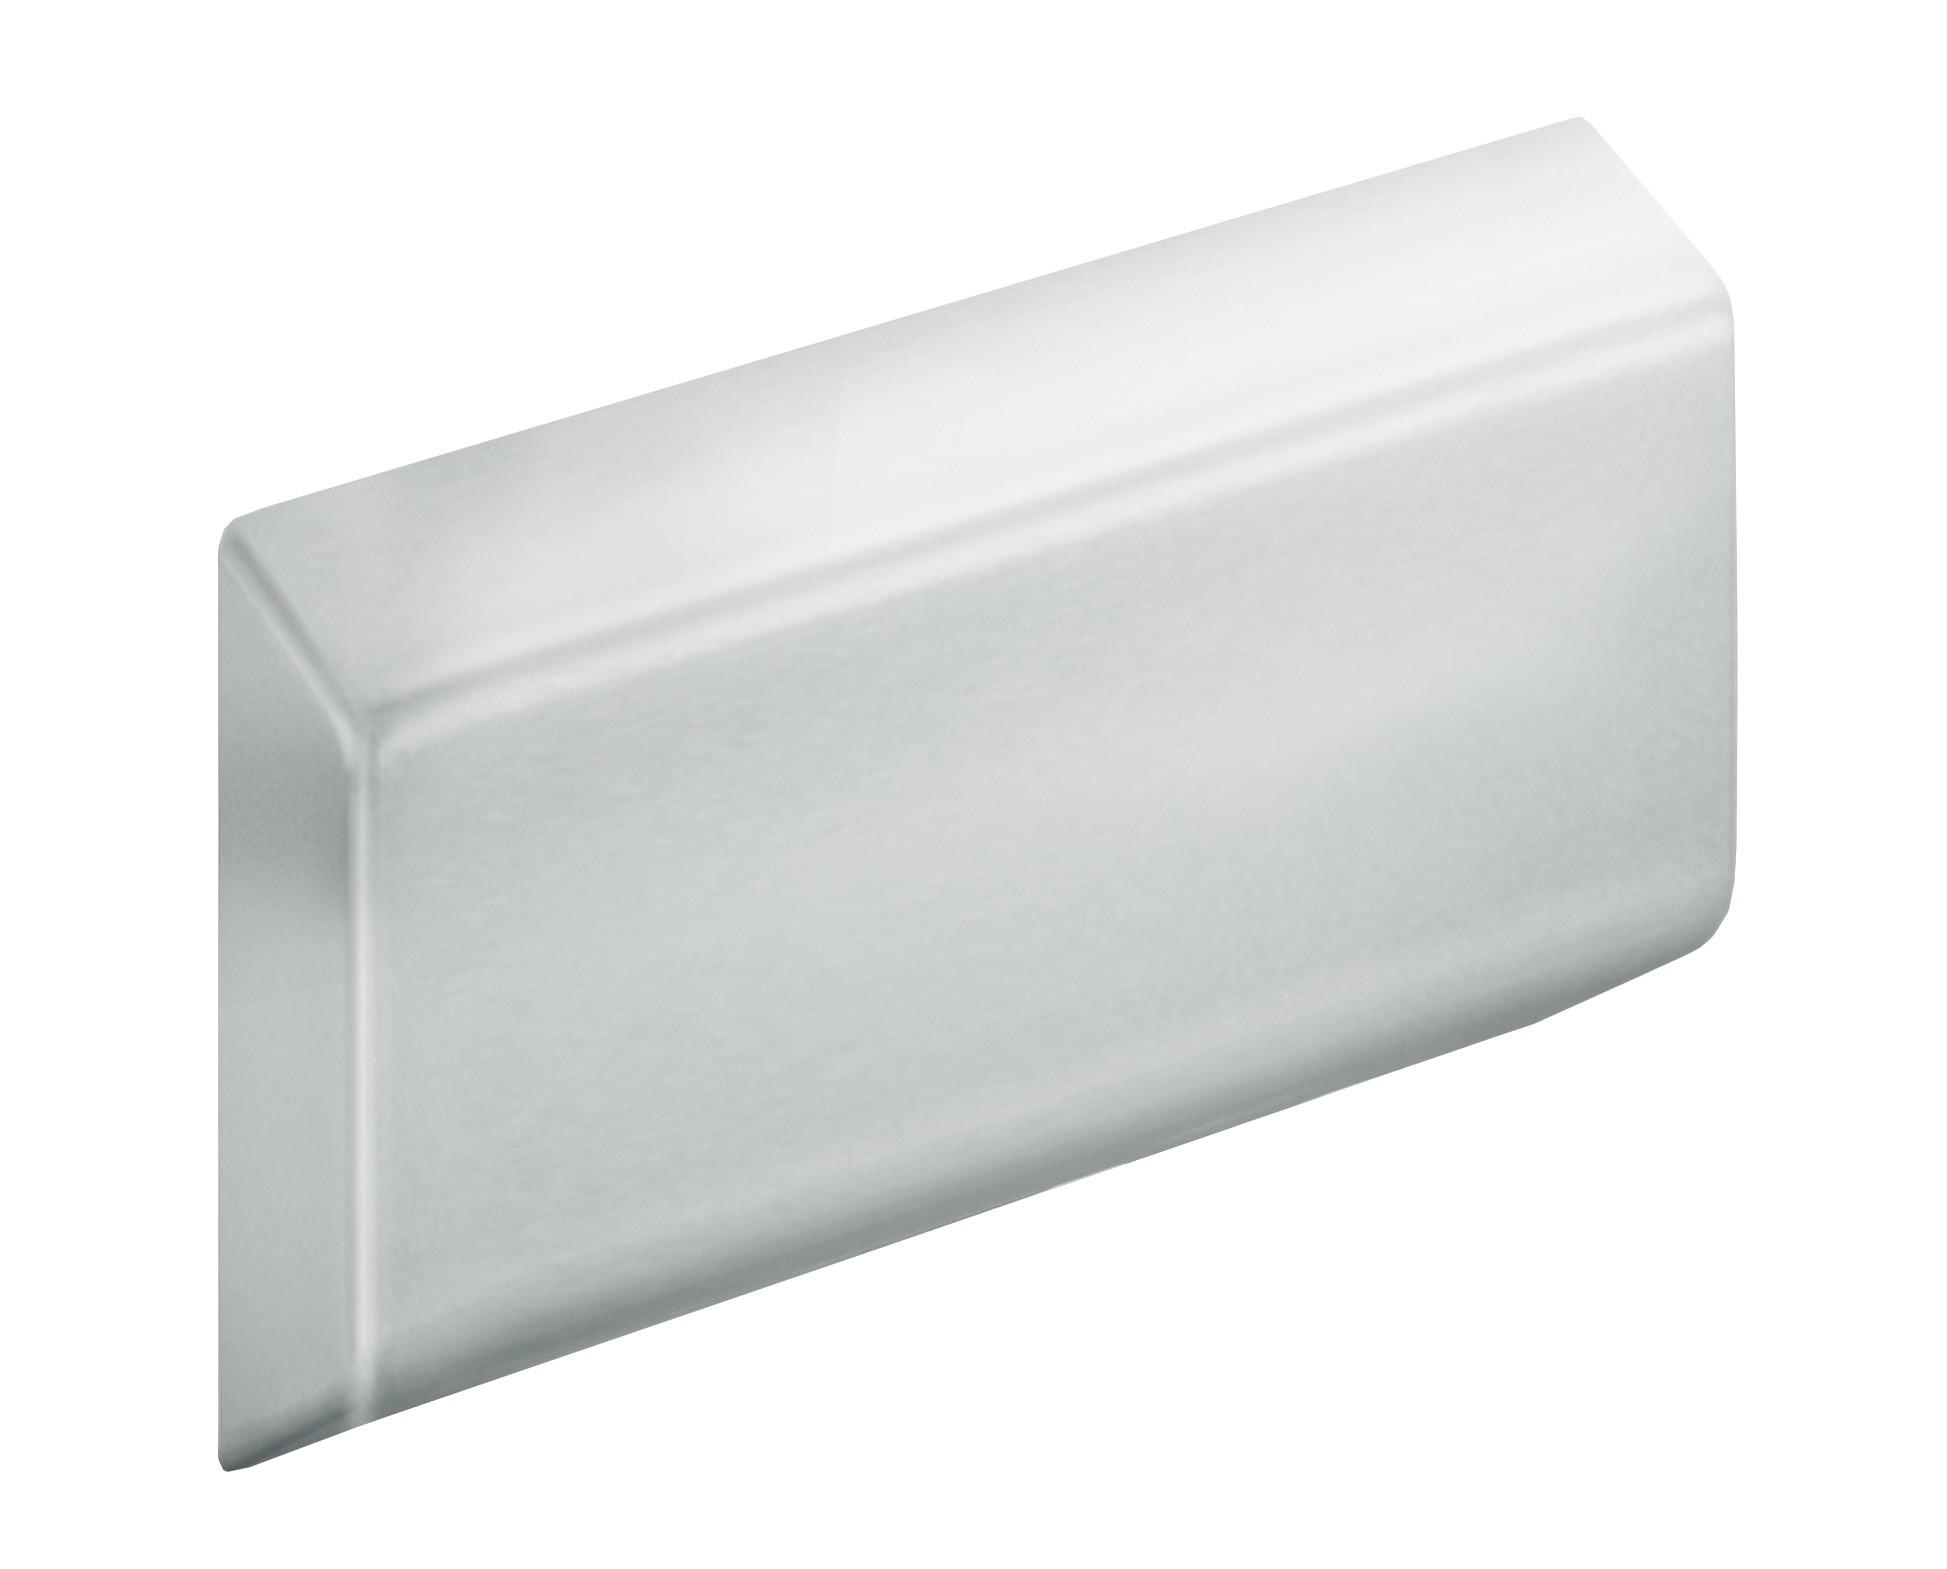 FSB Abdeckplatte ohne Trägerplatte A100 Austerngrau (0 82 8421 00101 8803)